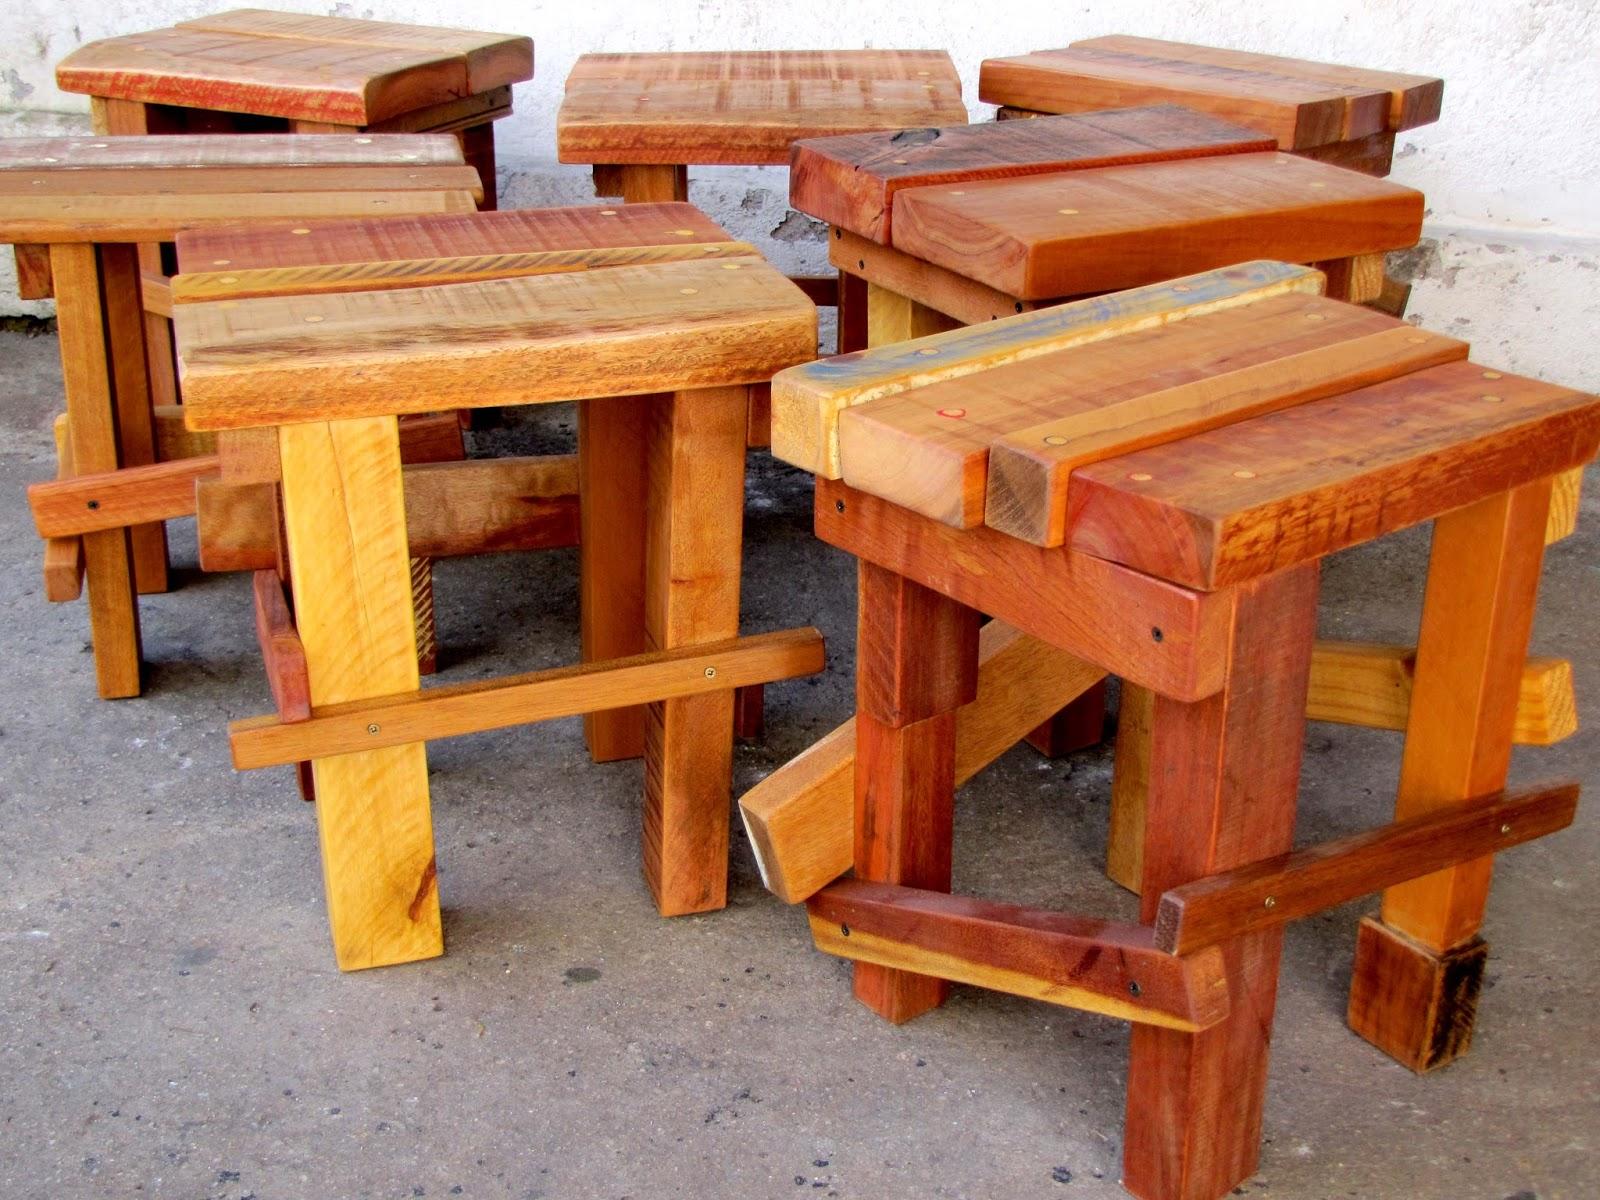 nossos colaboradores comércio de madeiras santorini procisa do brasil #C58406 1600x1200